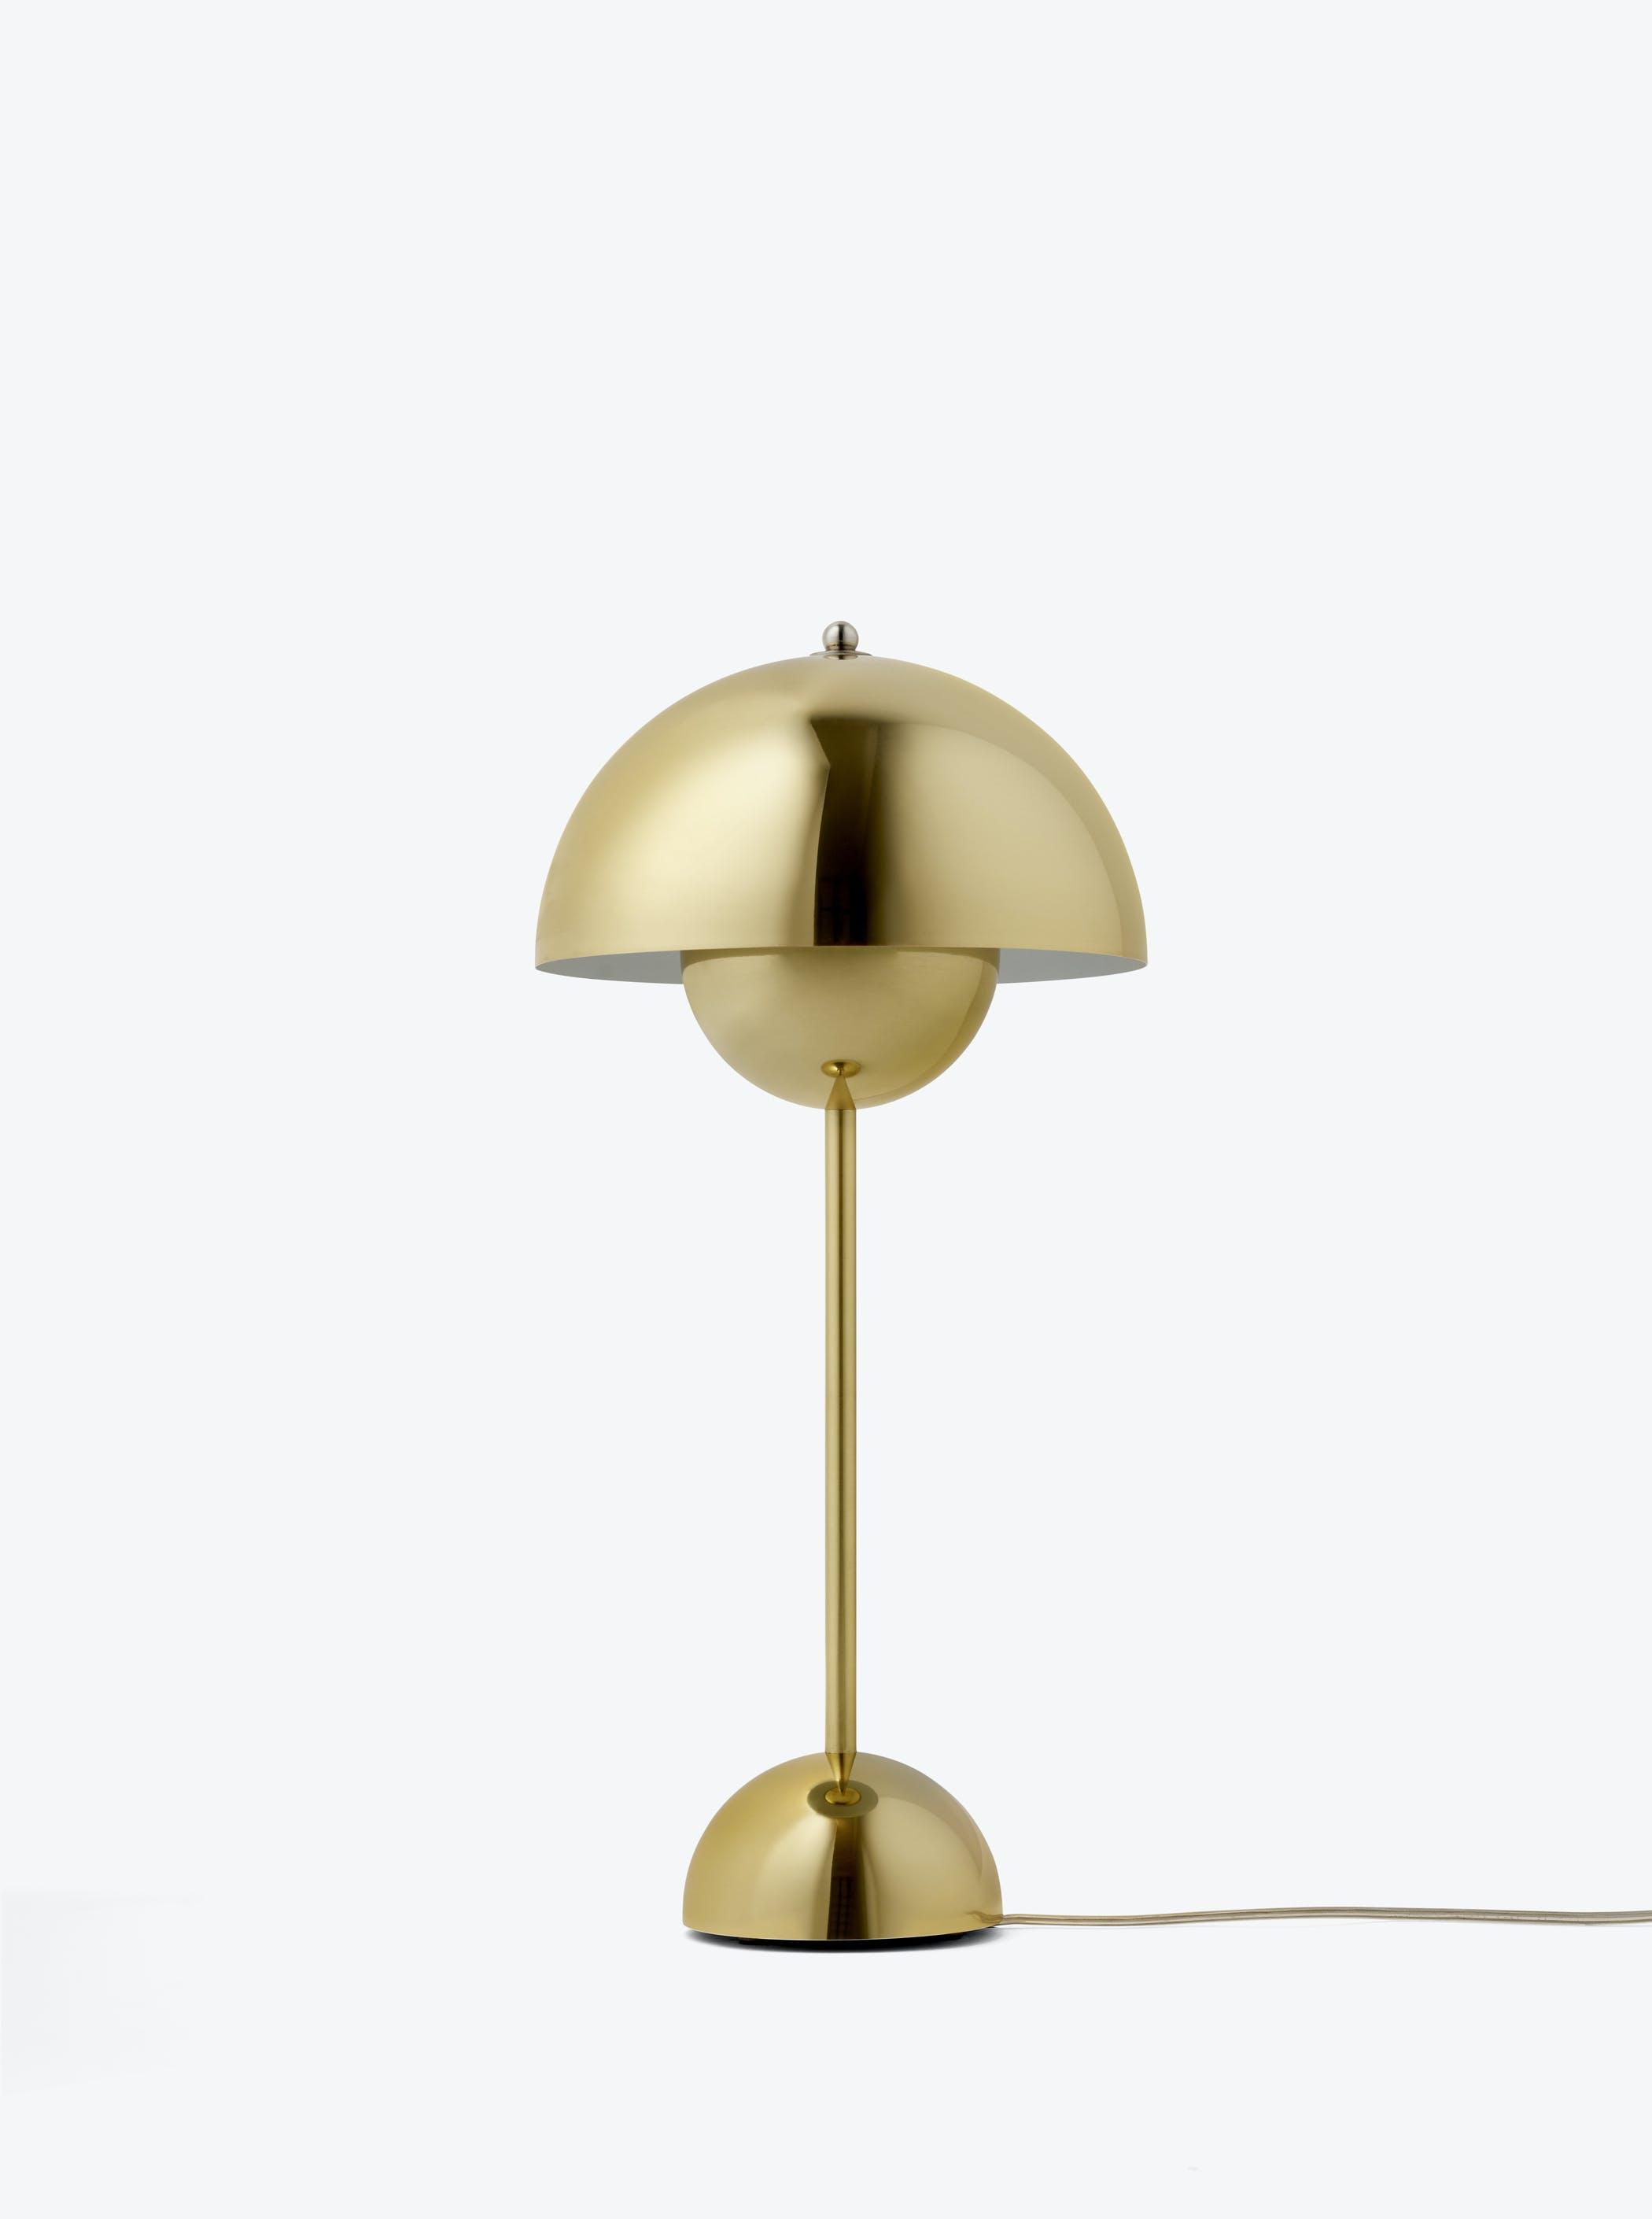 Flowerpot Vp3 Polished Brass Light